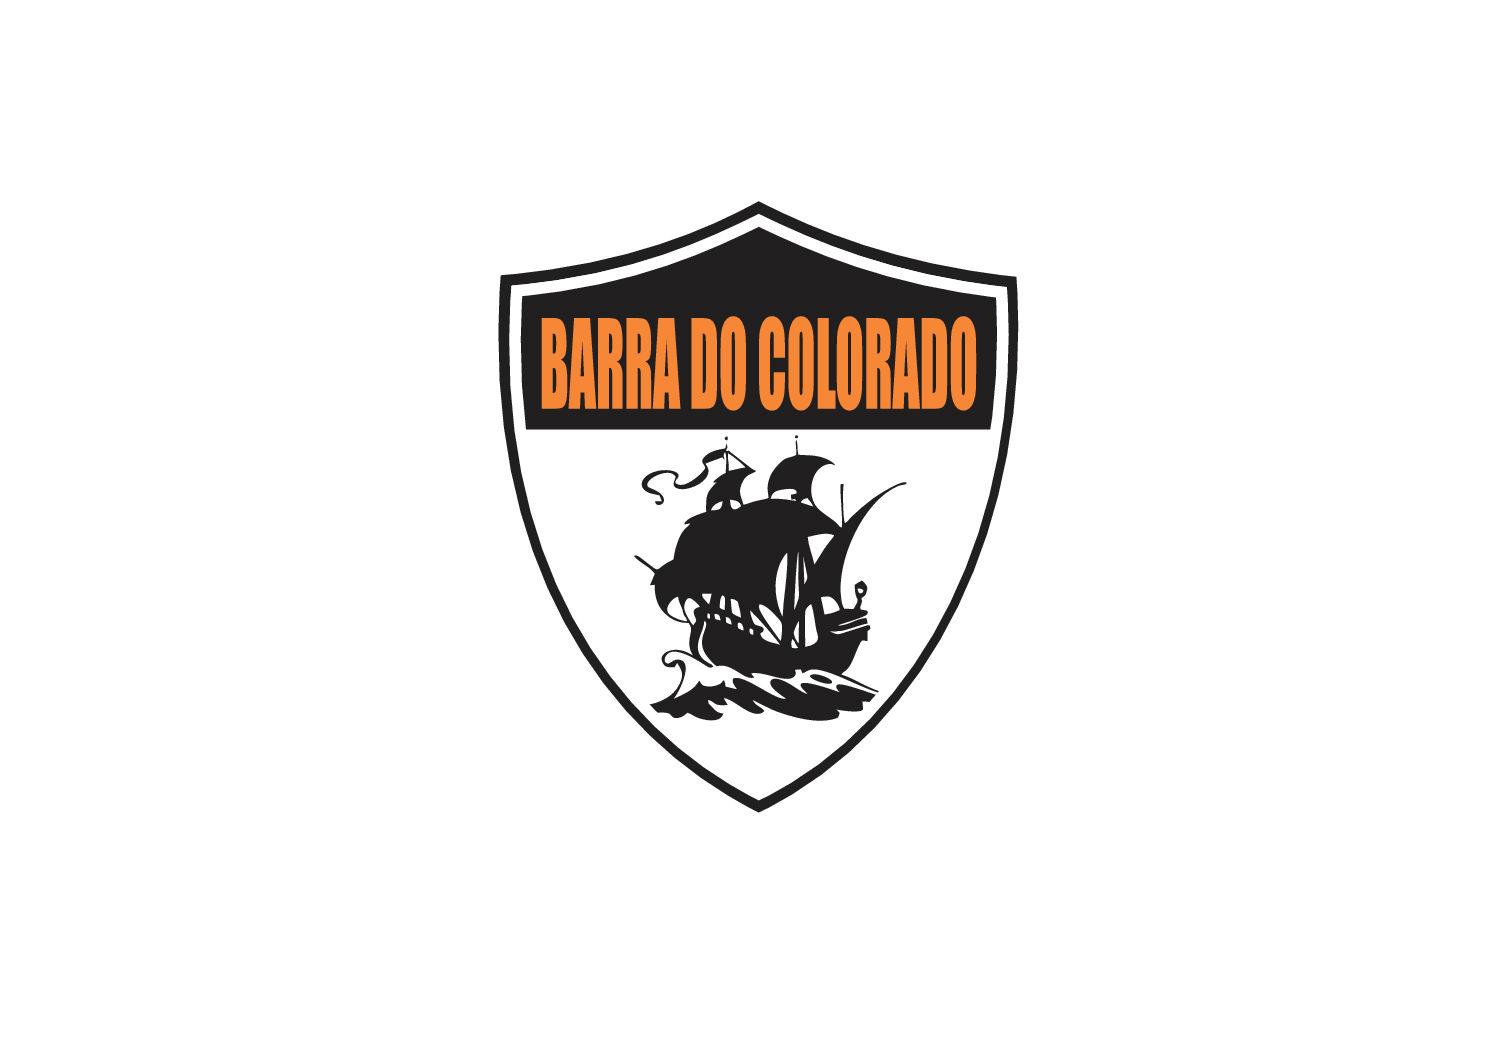 Fardamento personalizado para equipe da Barra do Colorado, da cidade de Selbach/RS.